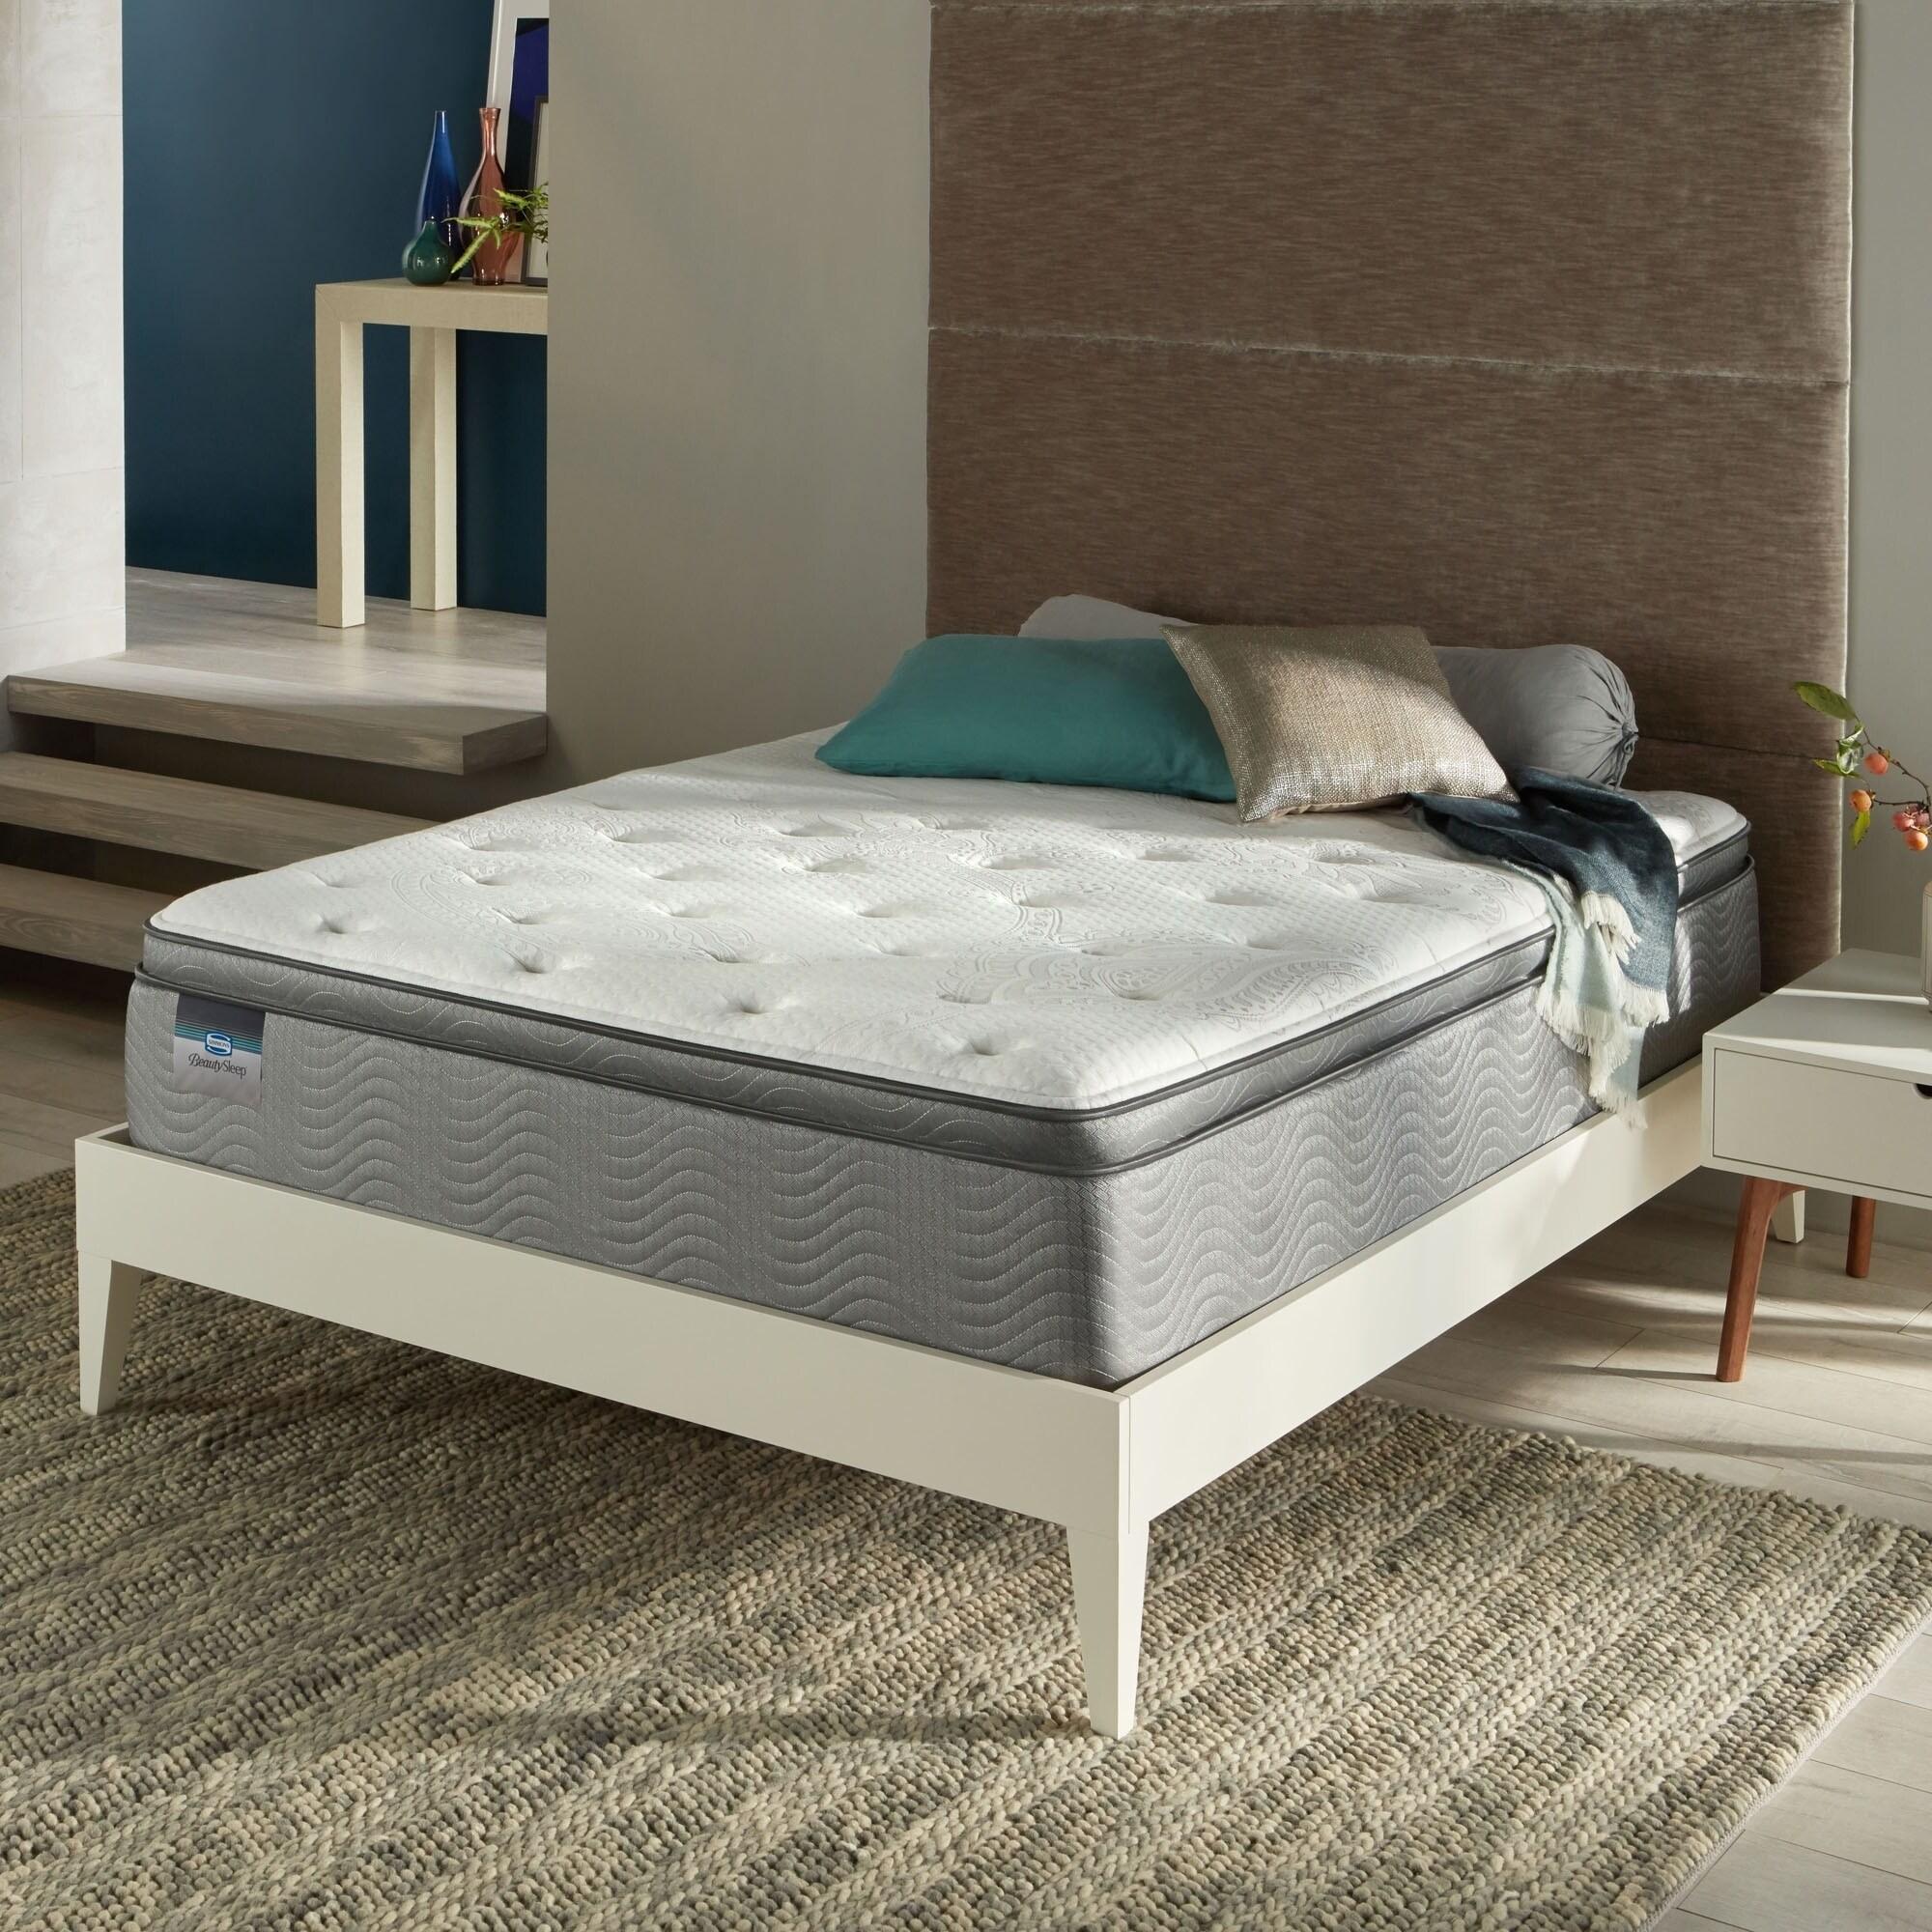 Beautysleep Swanson 12 Luxury King Size Firm Pillow Top Mattress On Free Shipping Today 20708629